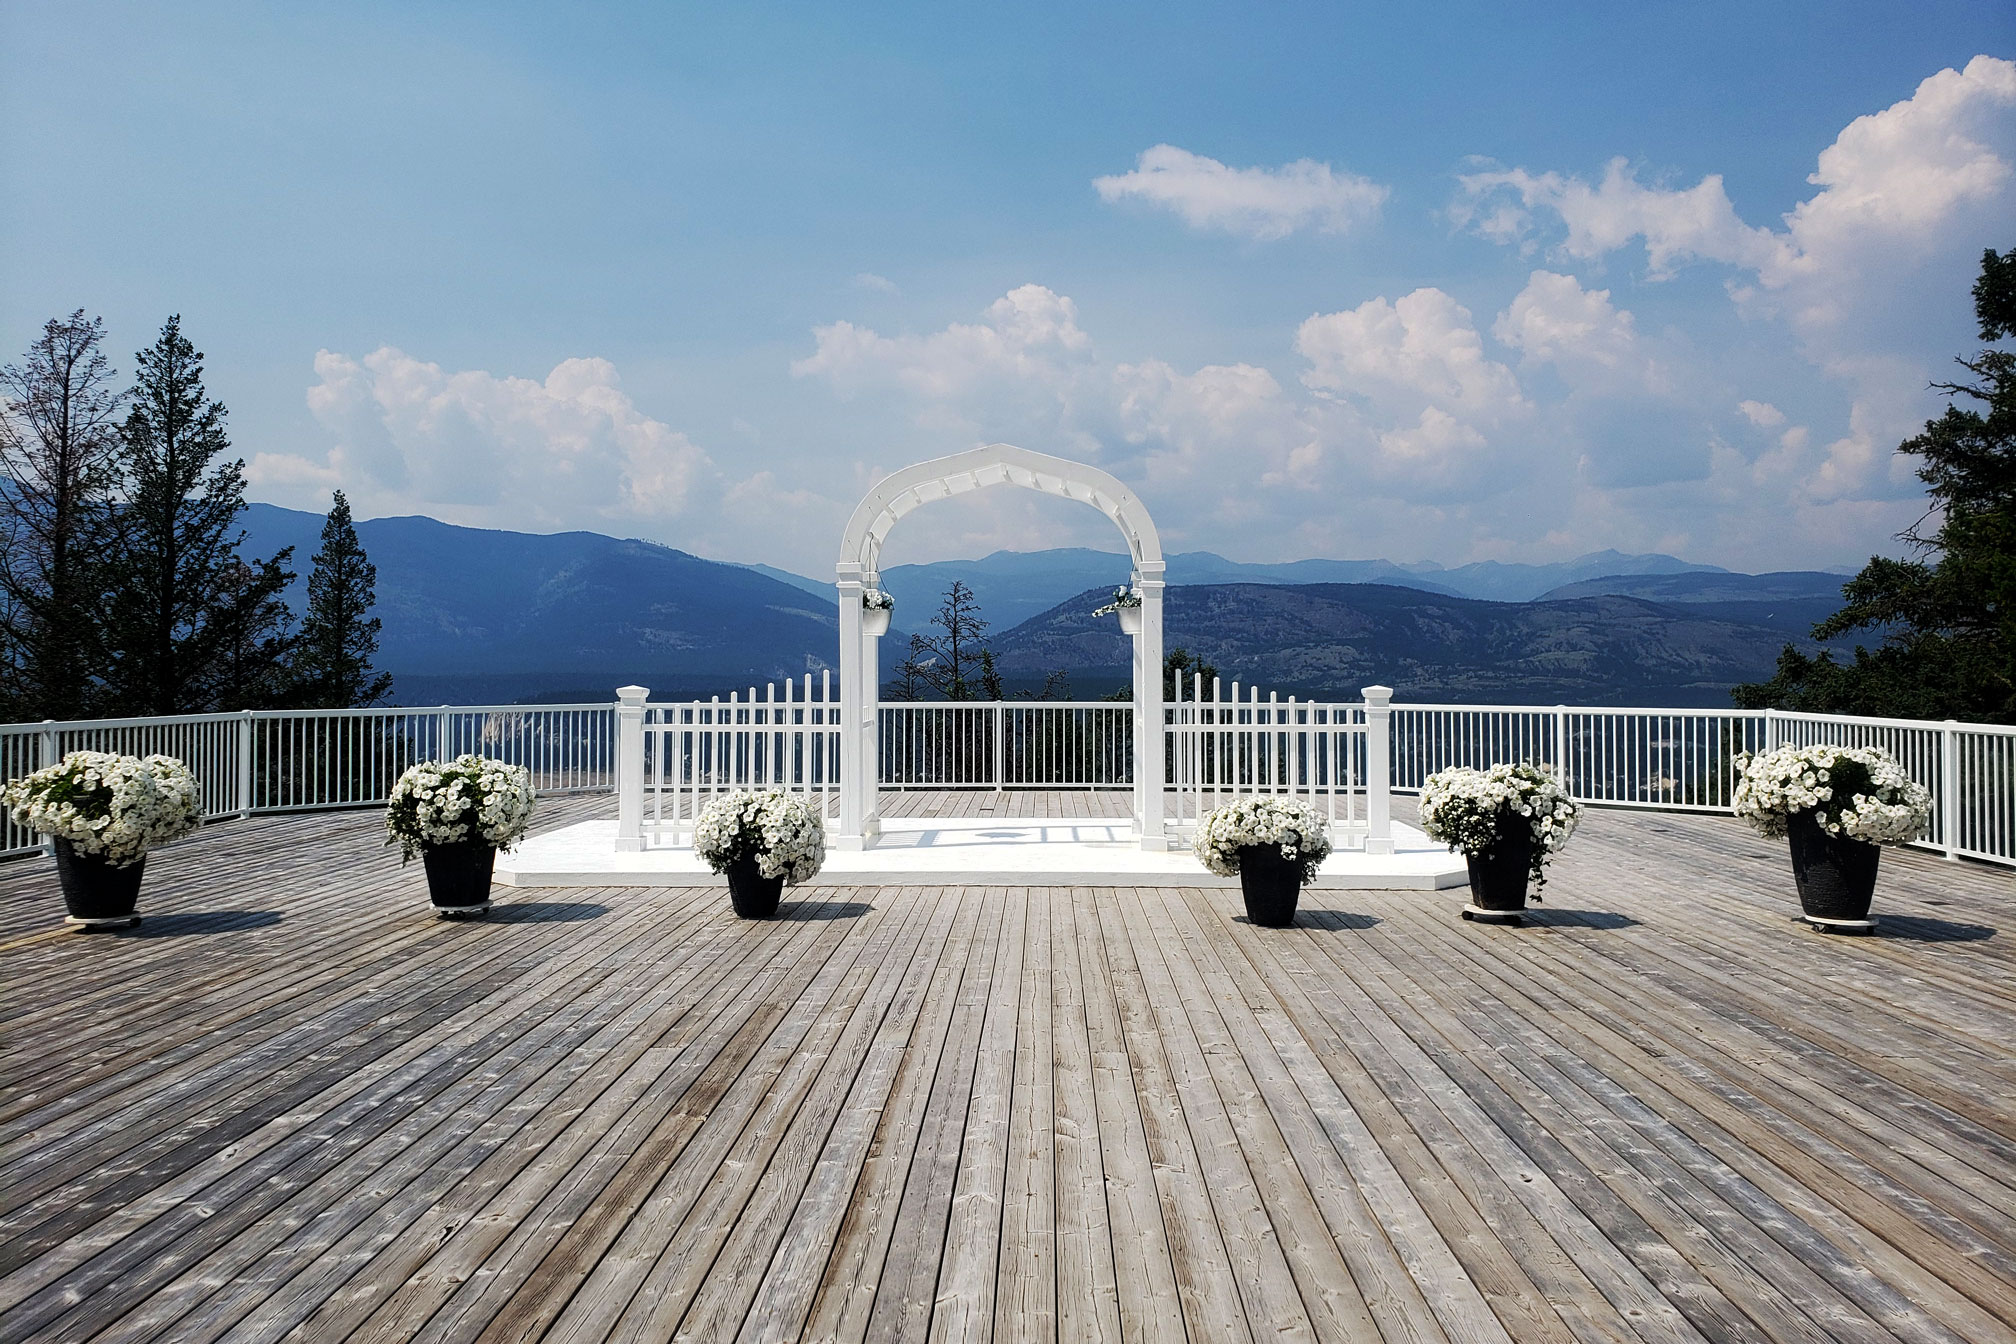 The wedding platform at Fairmont Hot Springs Resort